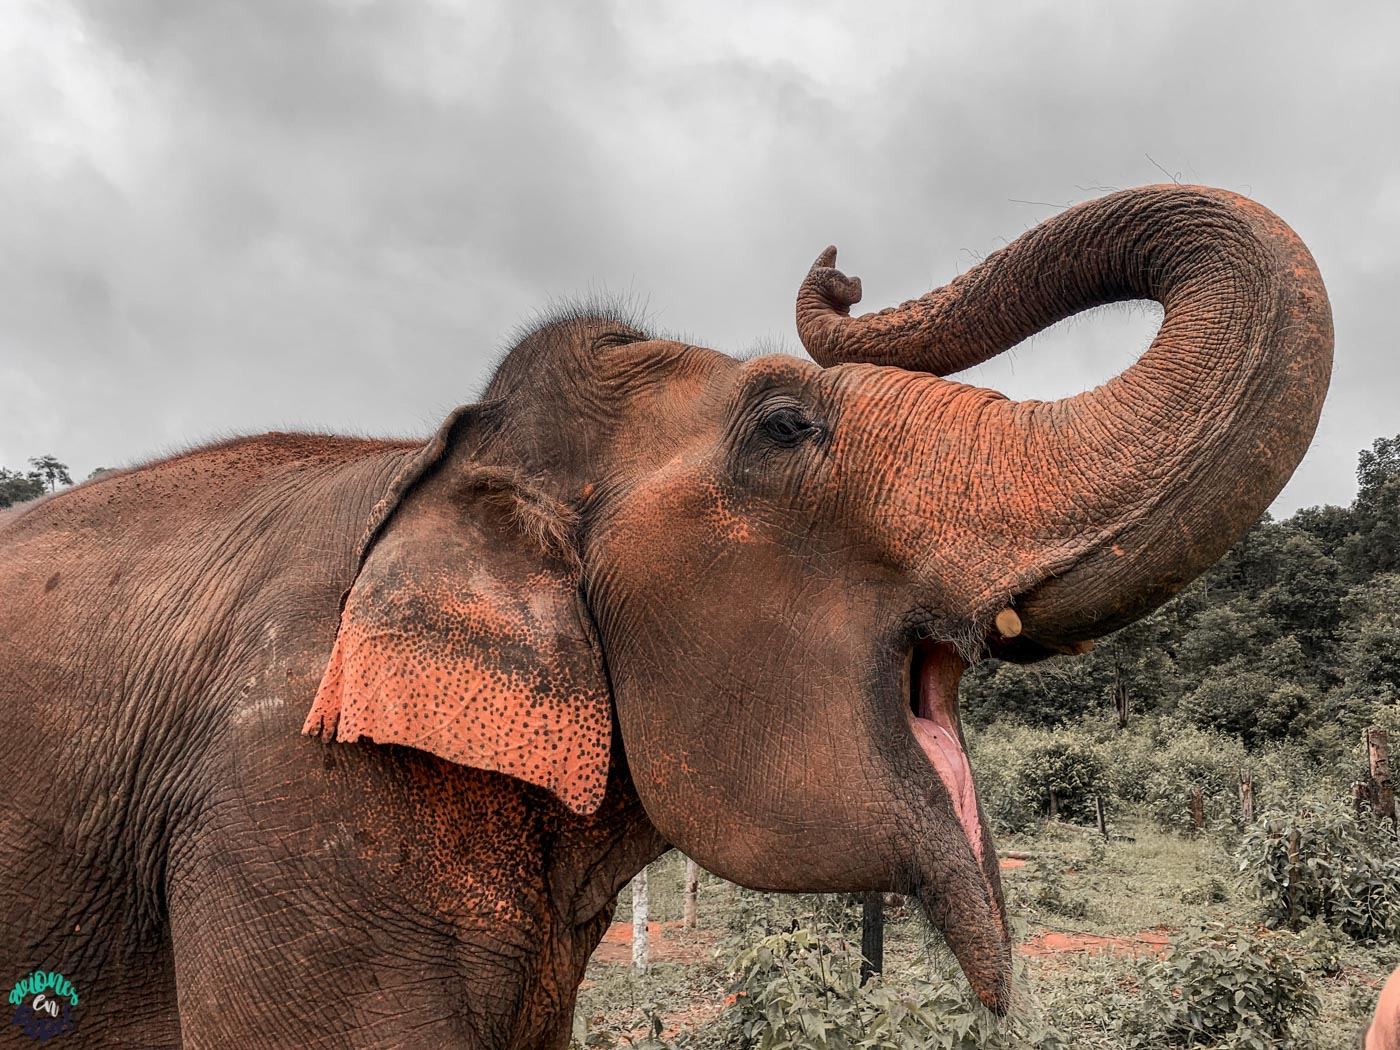 Qué hacer en Chiang Mai en 3 días: Visitar Elephant Nature Park